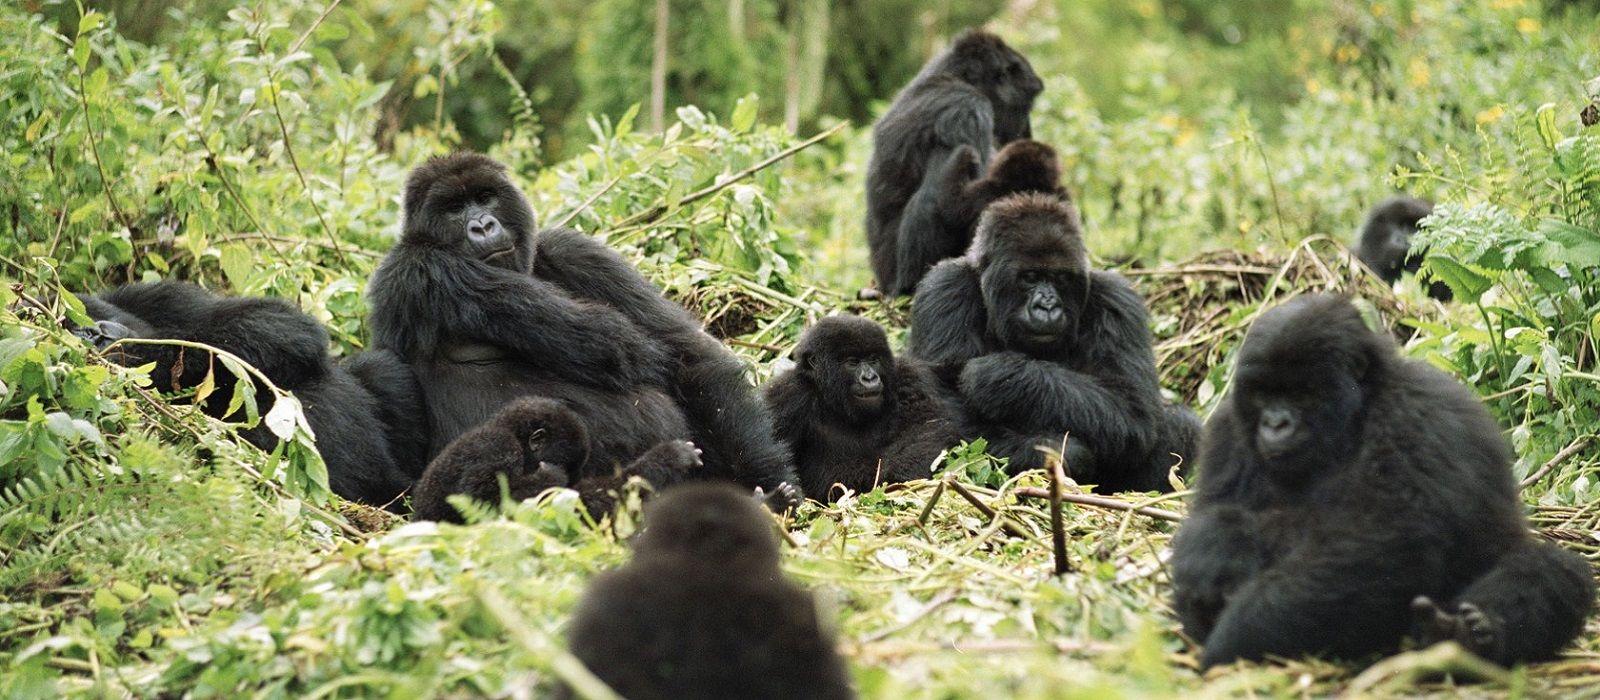 Gorillas, Great Migration and Indian Ocean Dreams Tour Trip 2